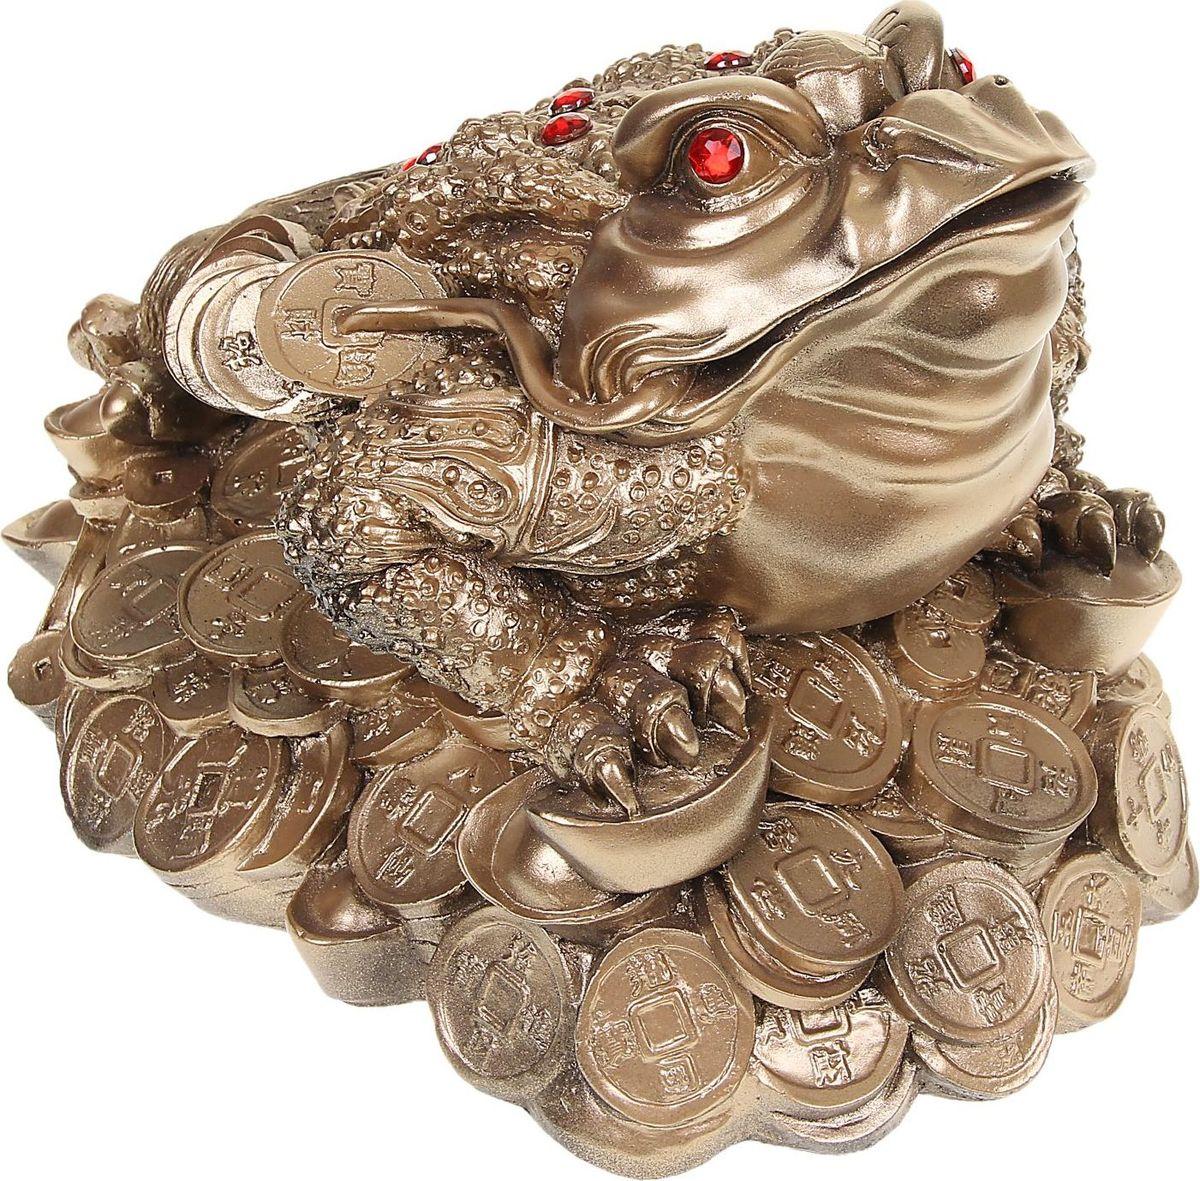 Копилка Premium Gips Денежная жаба, 25 х 32 х 24 см копилка premium gips денежная жаба 17 см х 19 см х 17 см